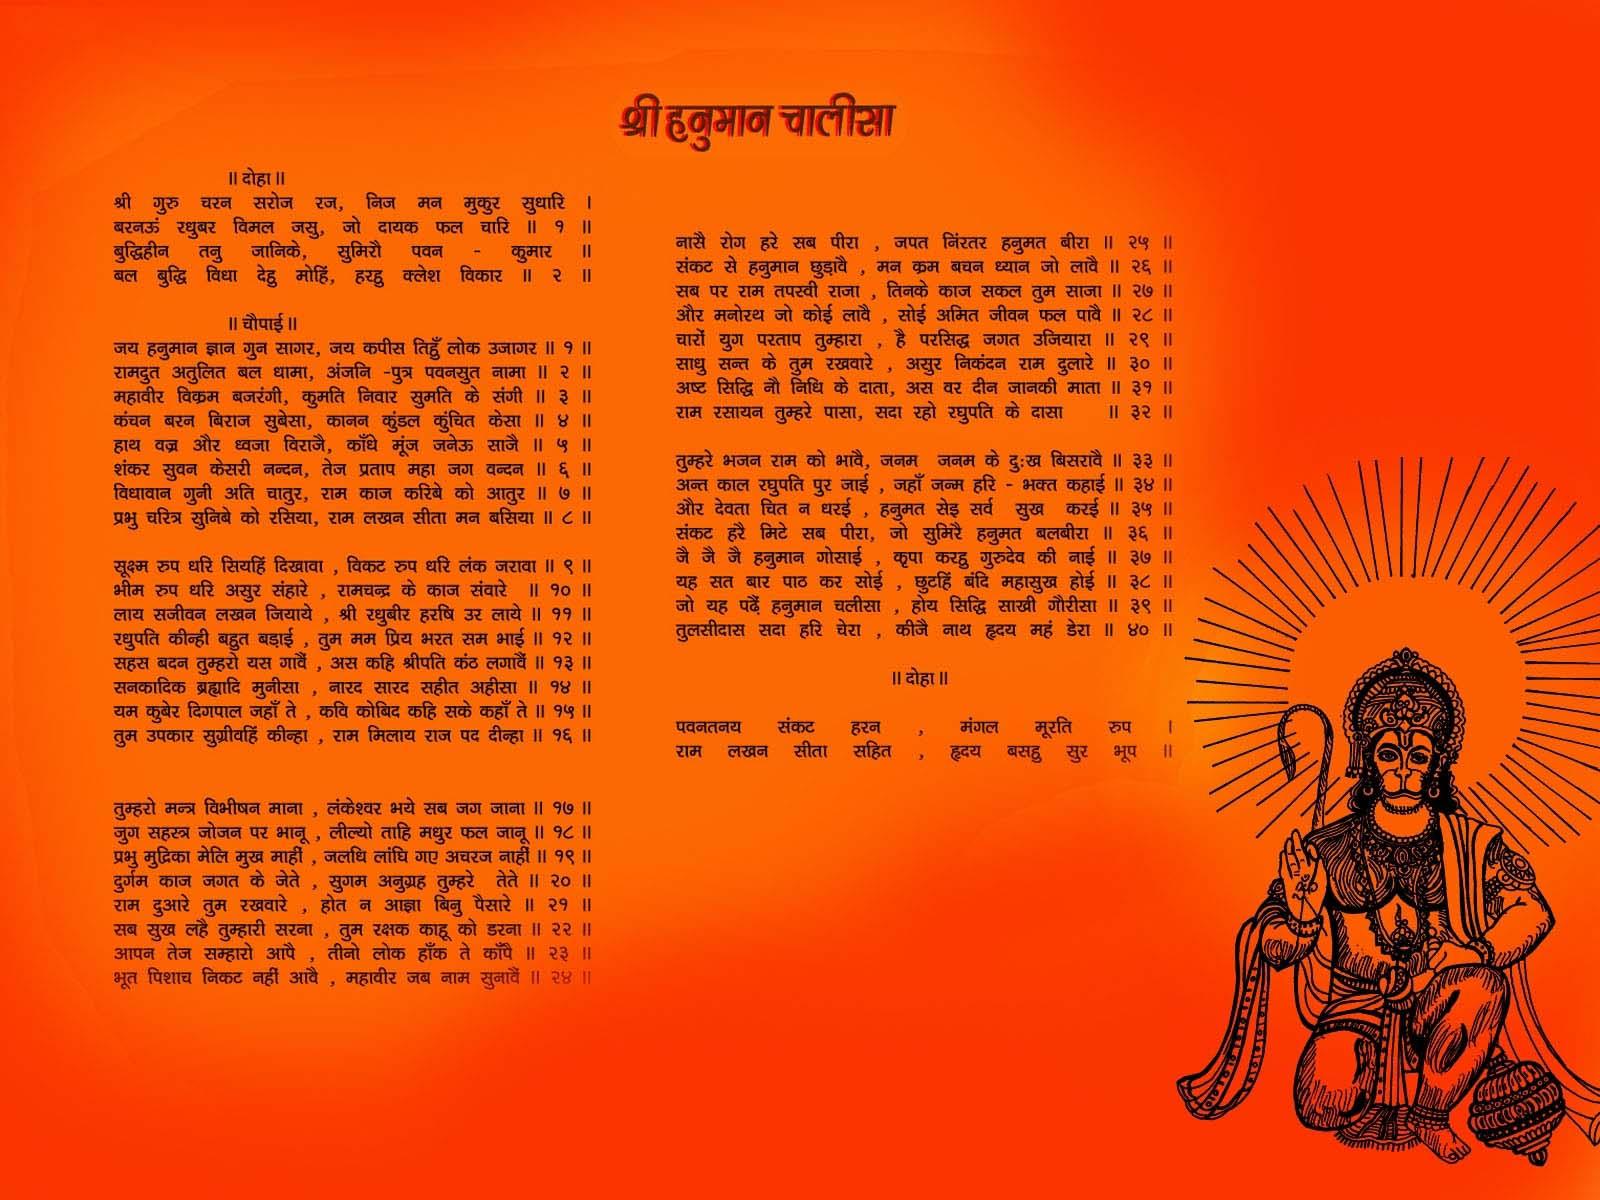 Lord Krishna Wallpaper Full Hd Hanuman Chalisa With Lord Hanuman Image Jpg Wordzz